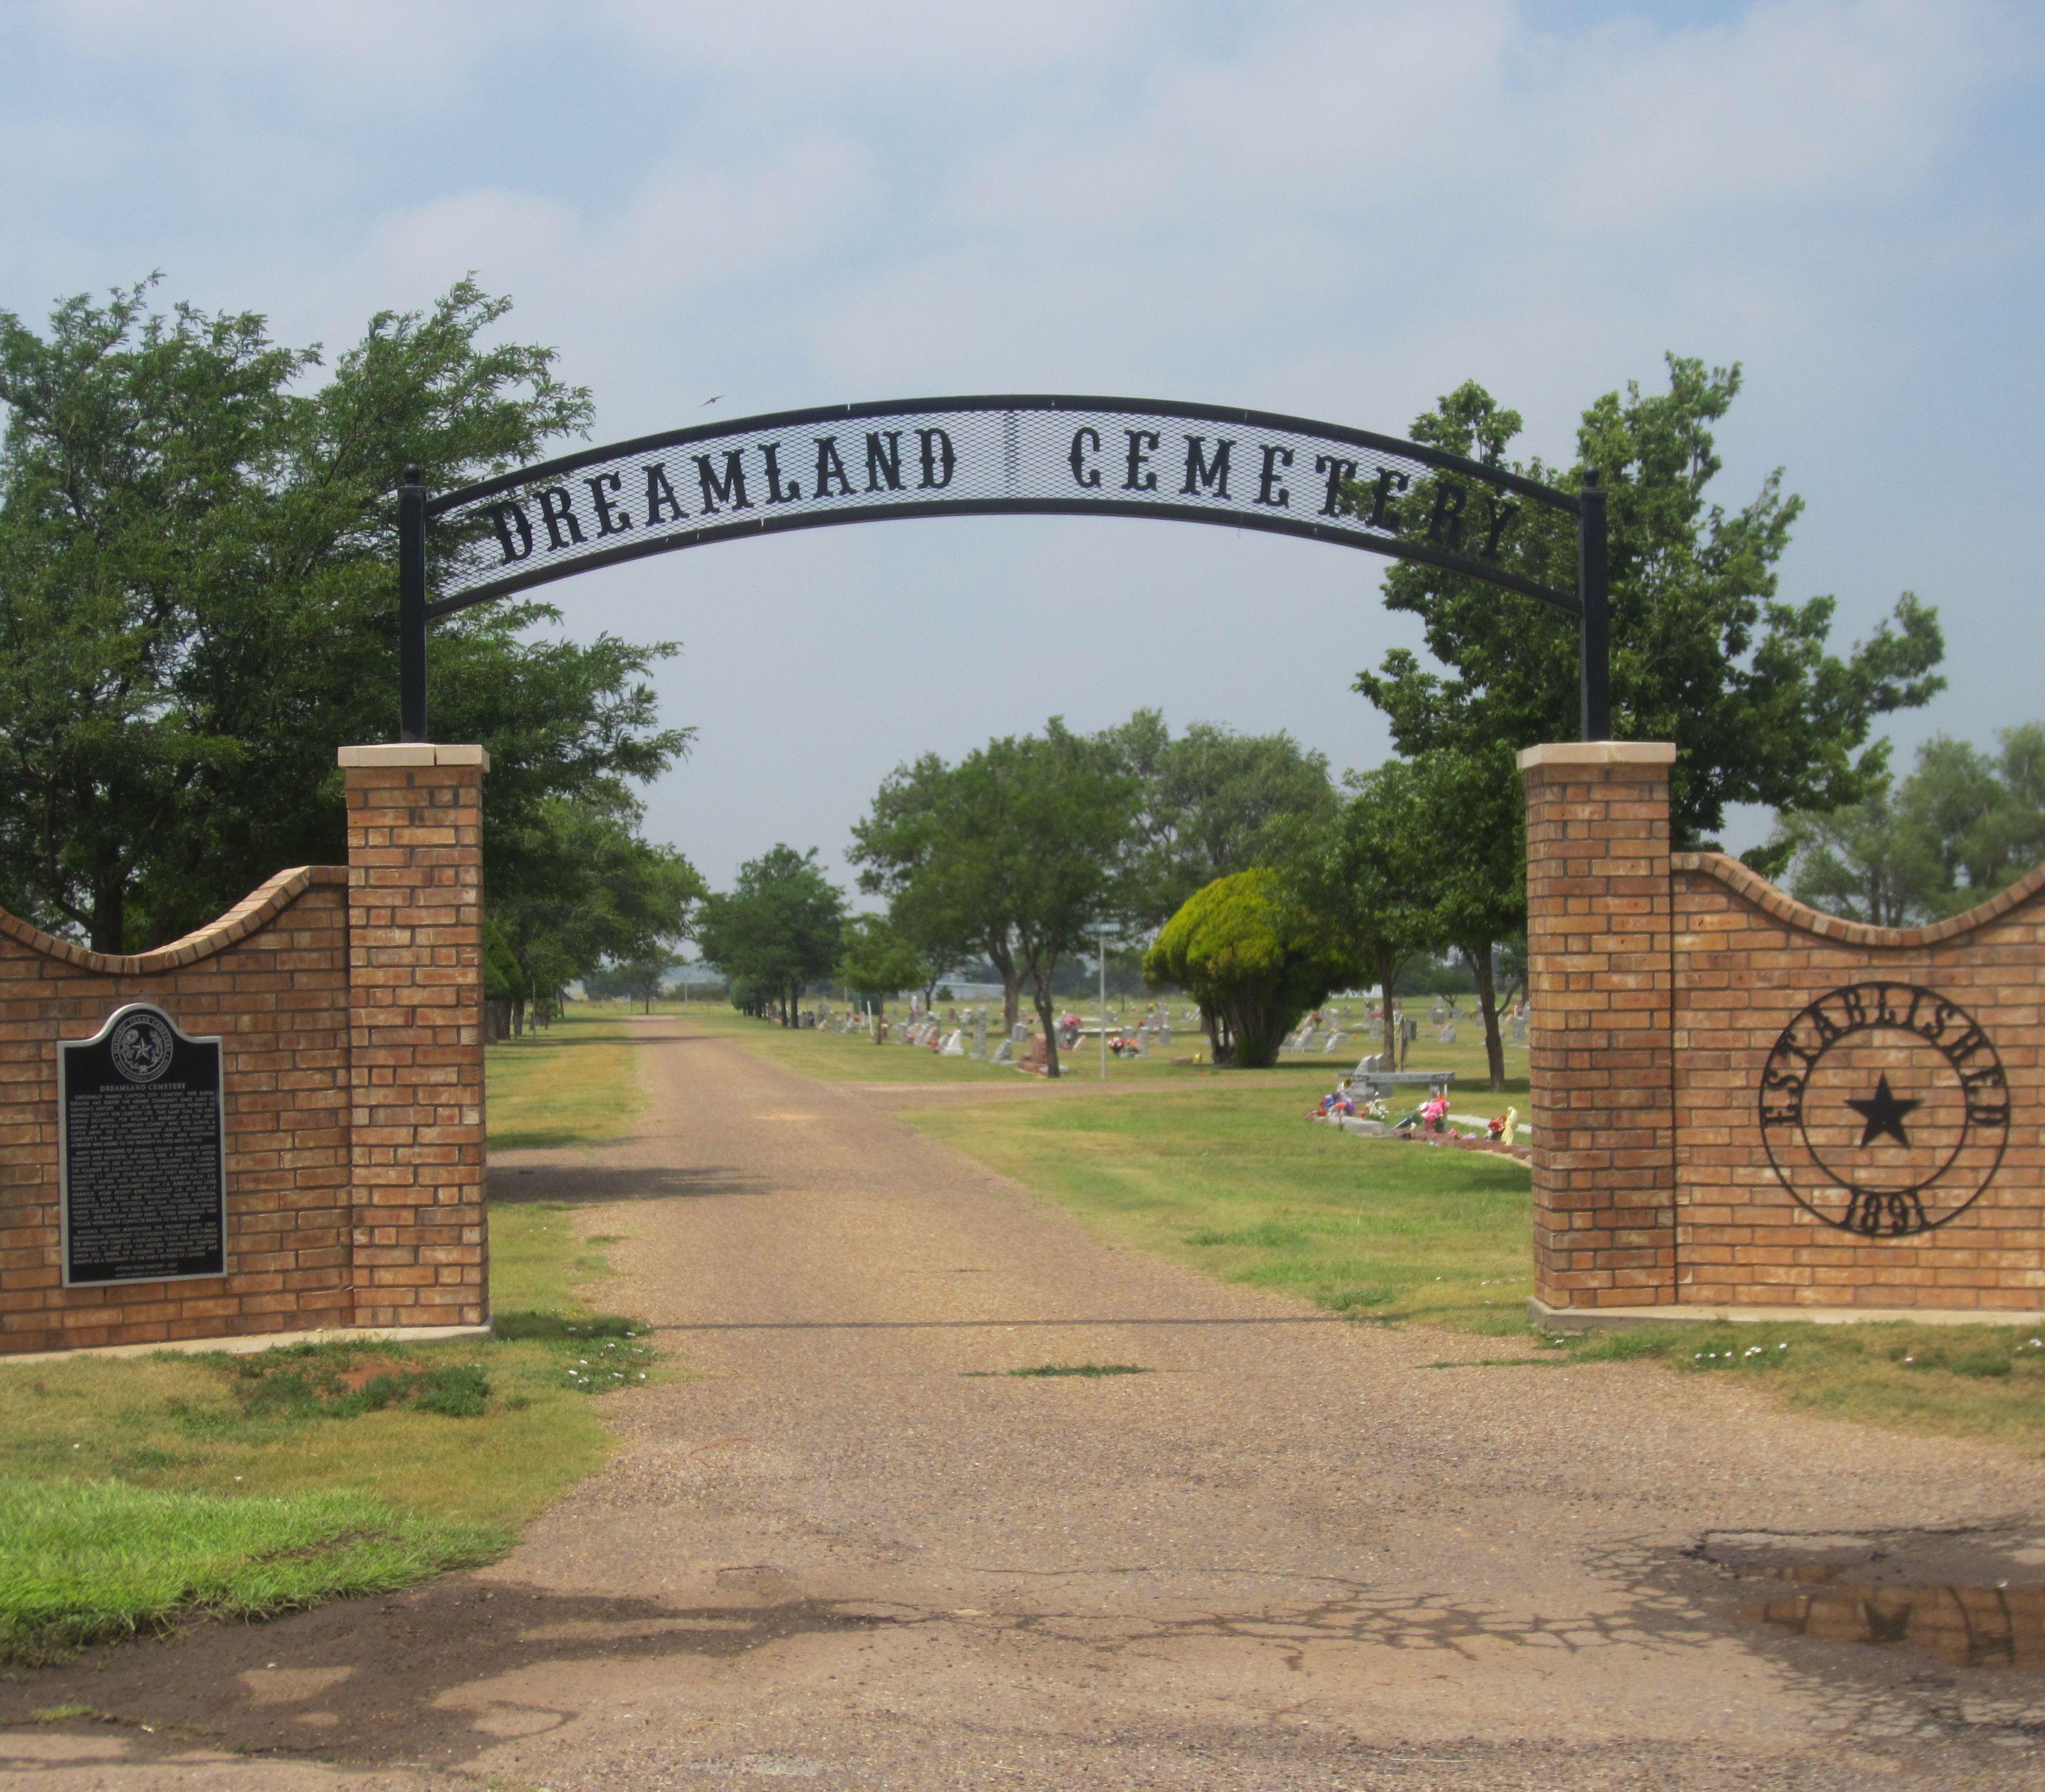 Dreamland Cemetery